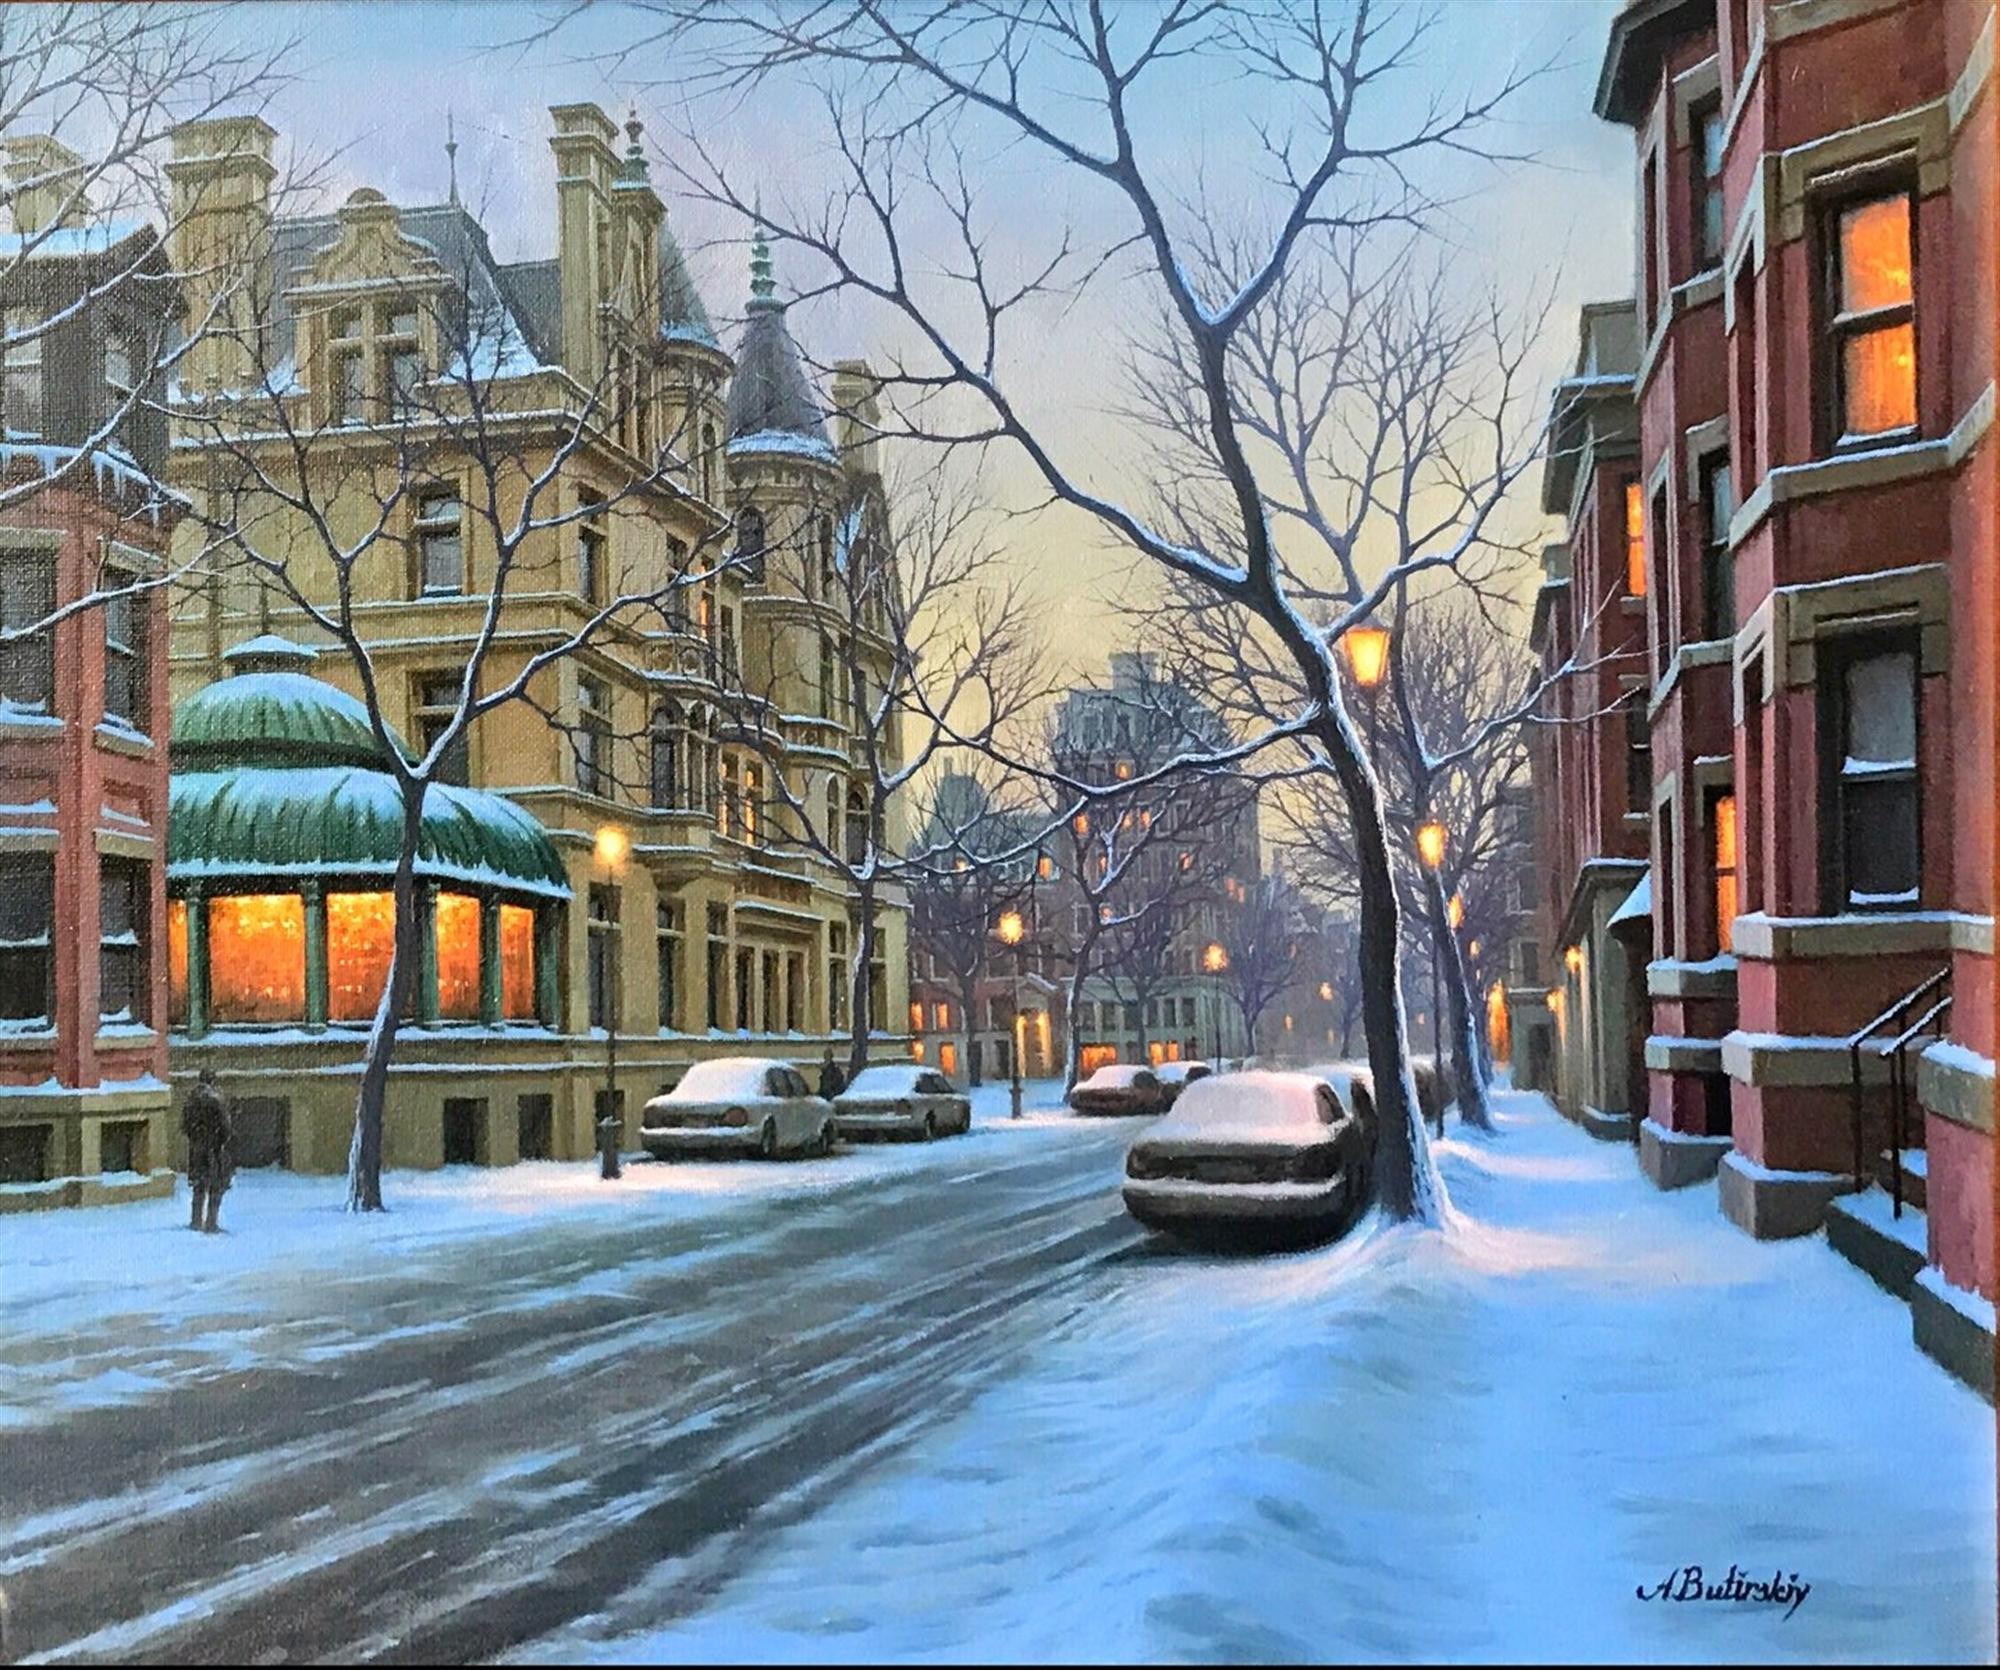 All Snowed In by Alexei Butirskiy